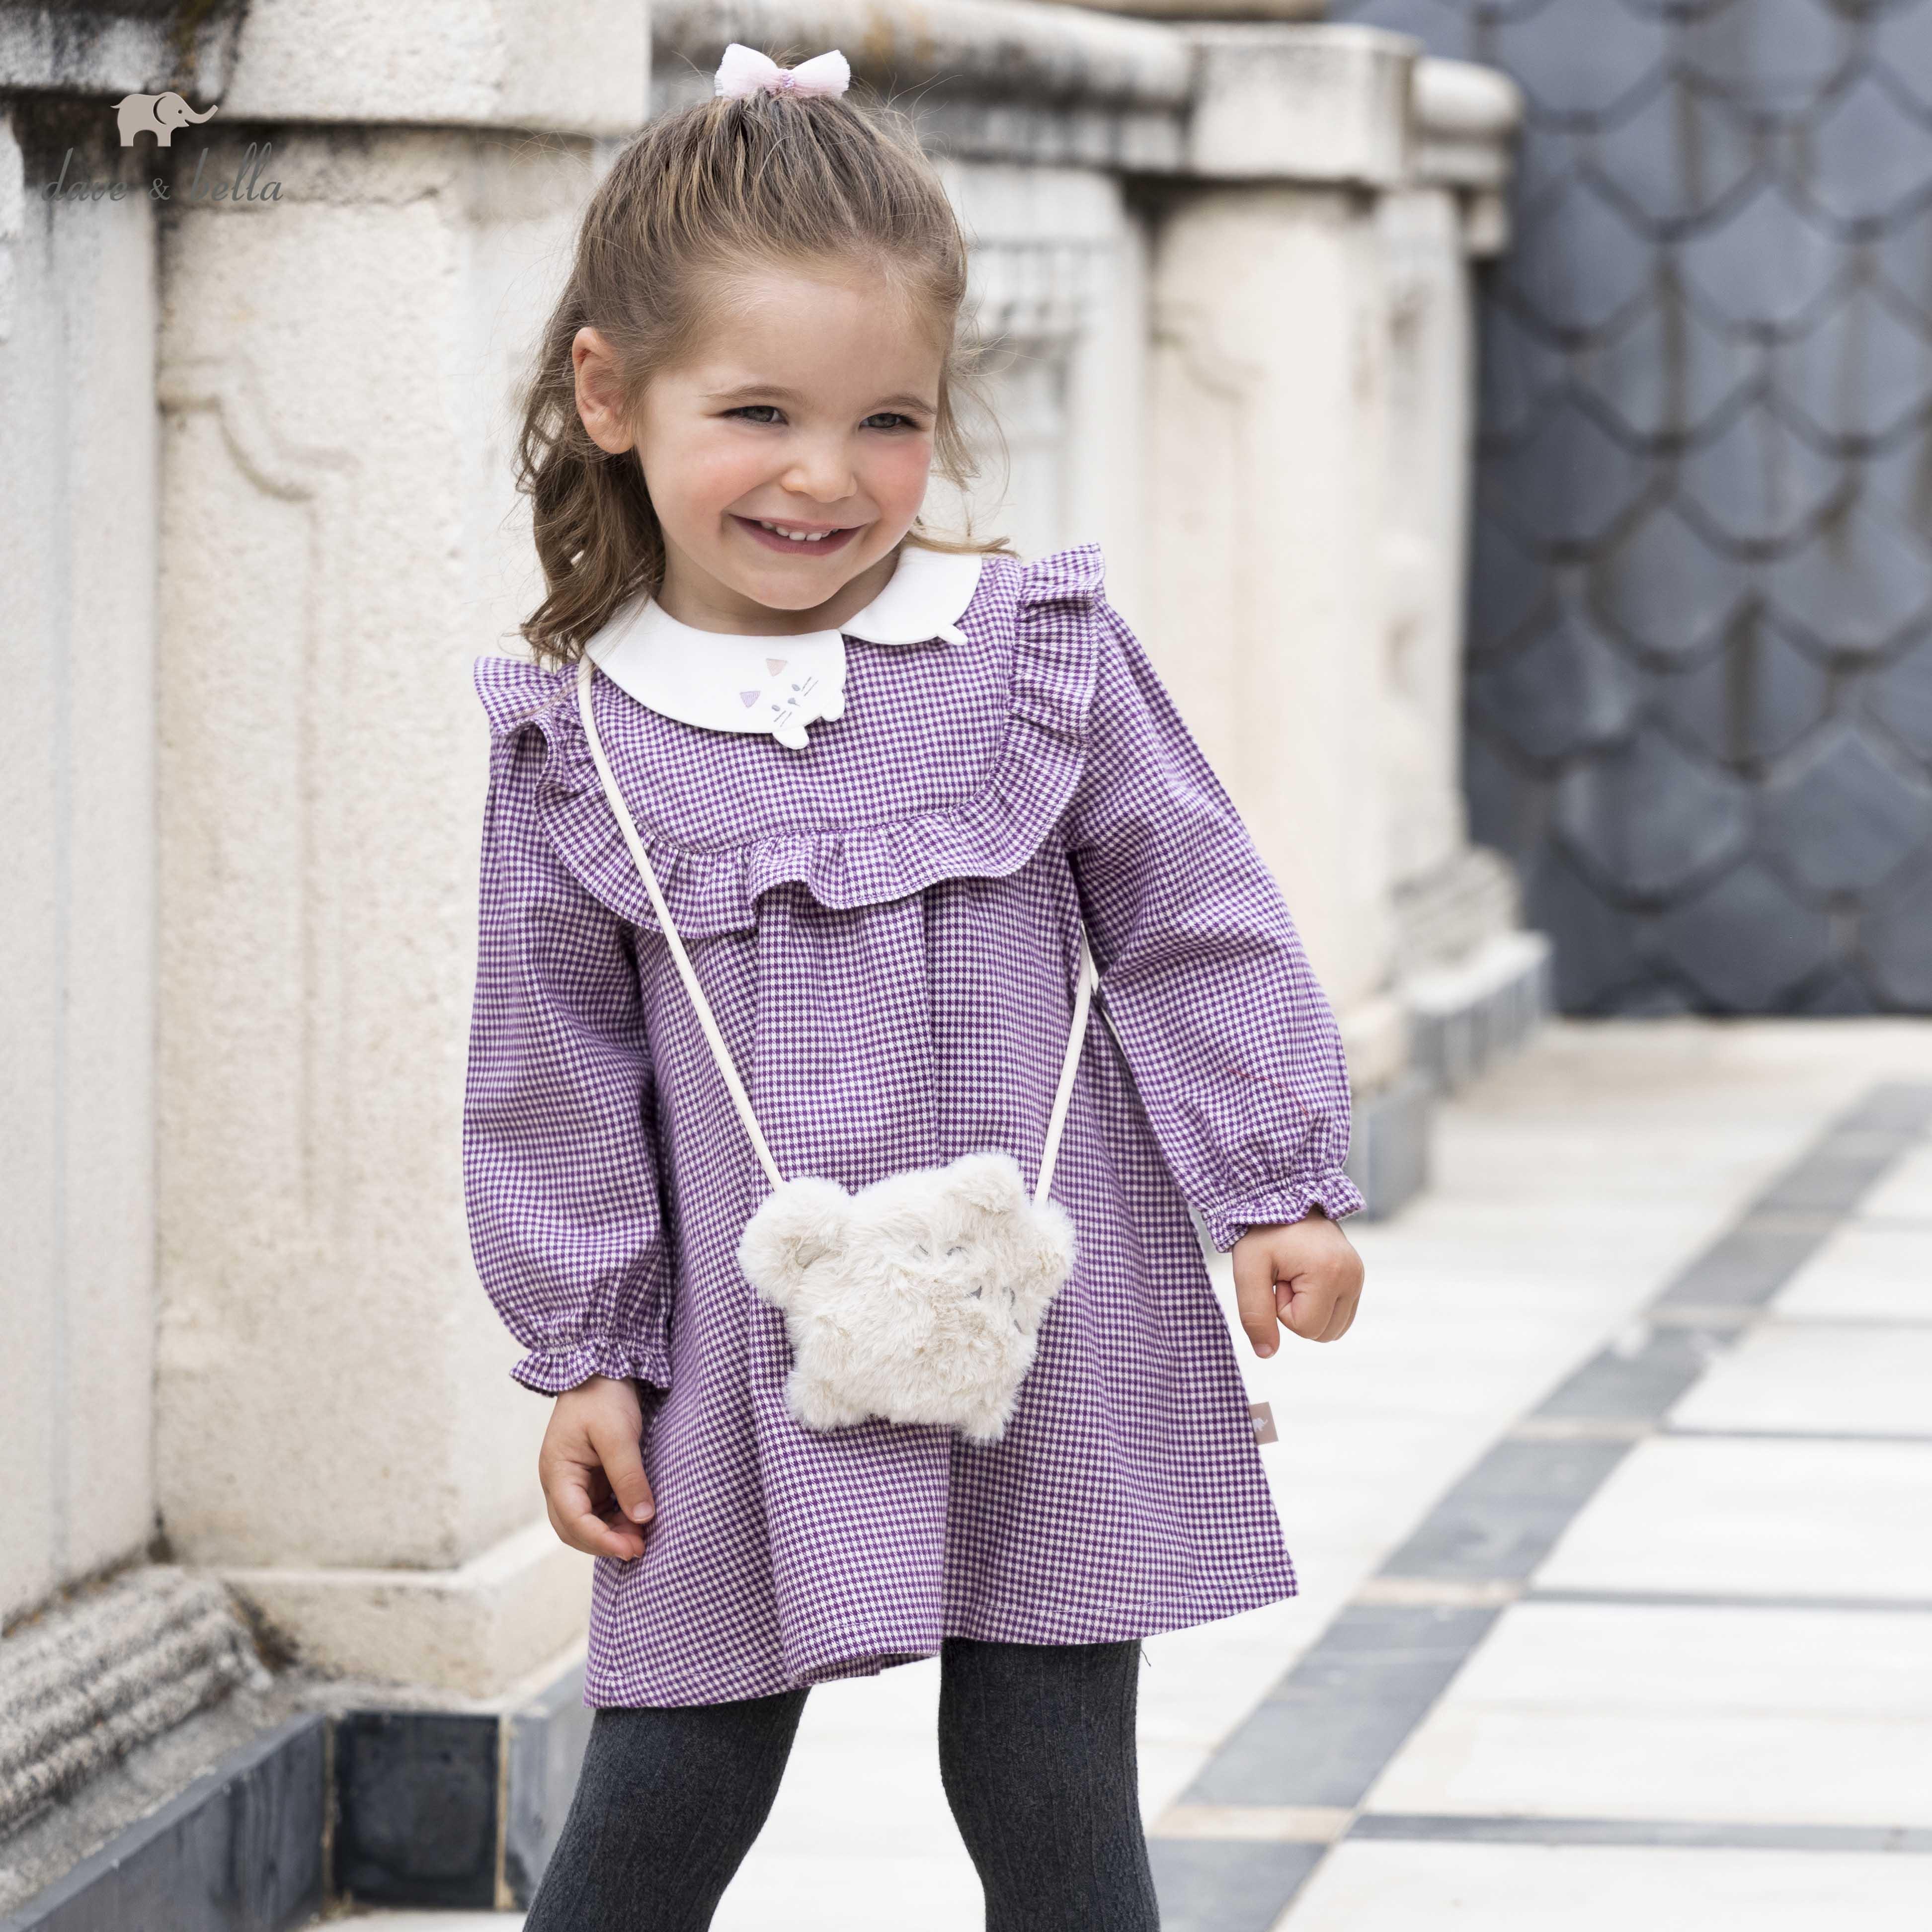 DBJ19263 ديف بيلا الخريف طفلة الموضة منقوشة فستان الكرتون مع حقيبة صغيرة فستان حفلة الاطفال الرضع لوليتا 2 قطعة الملابس